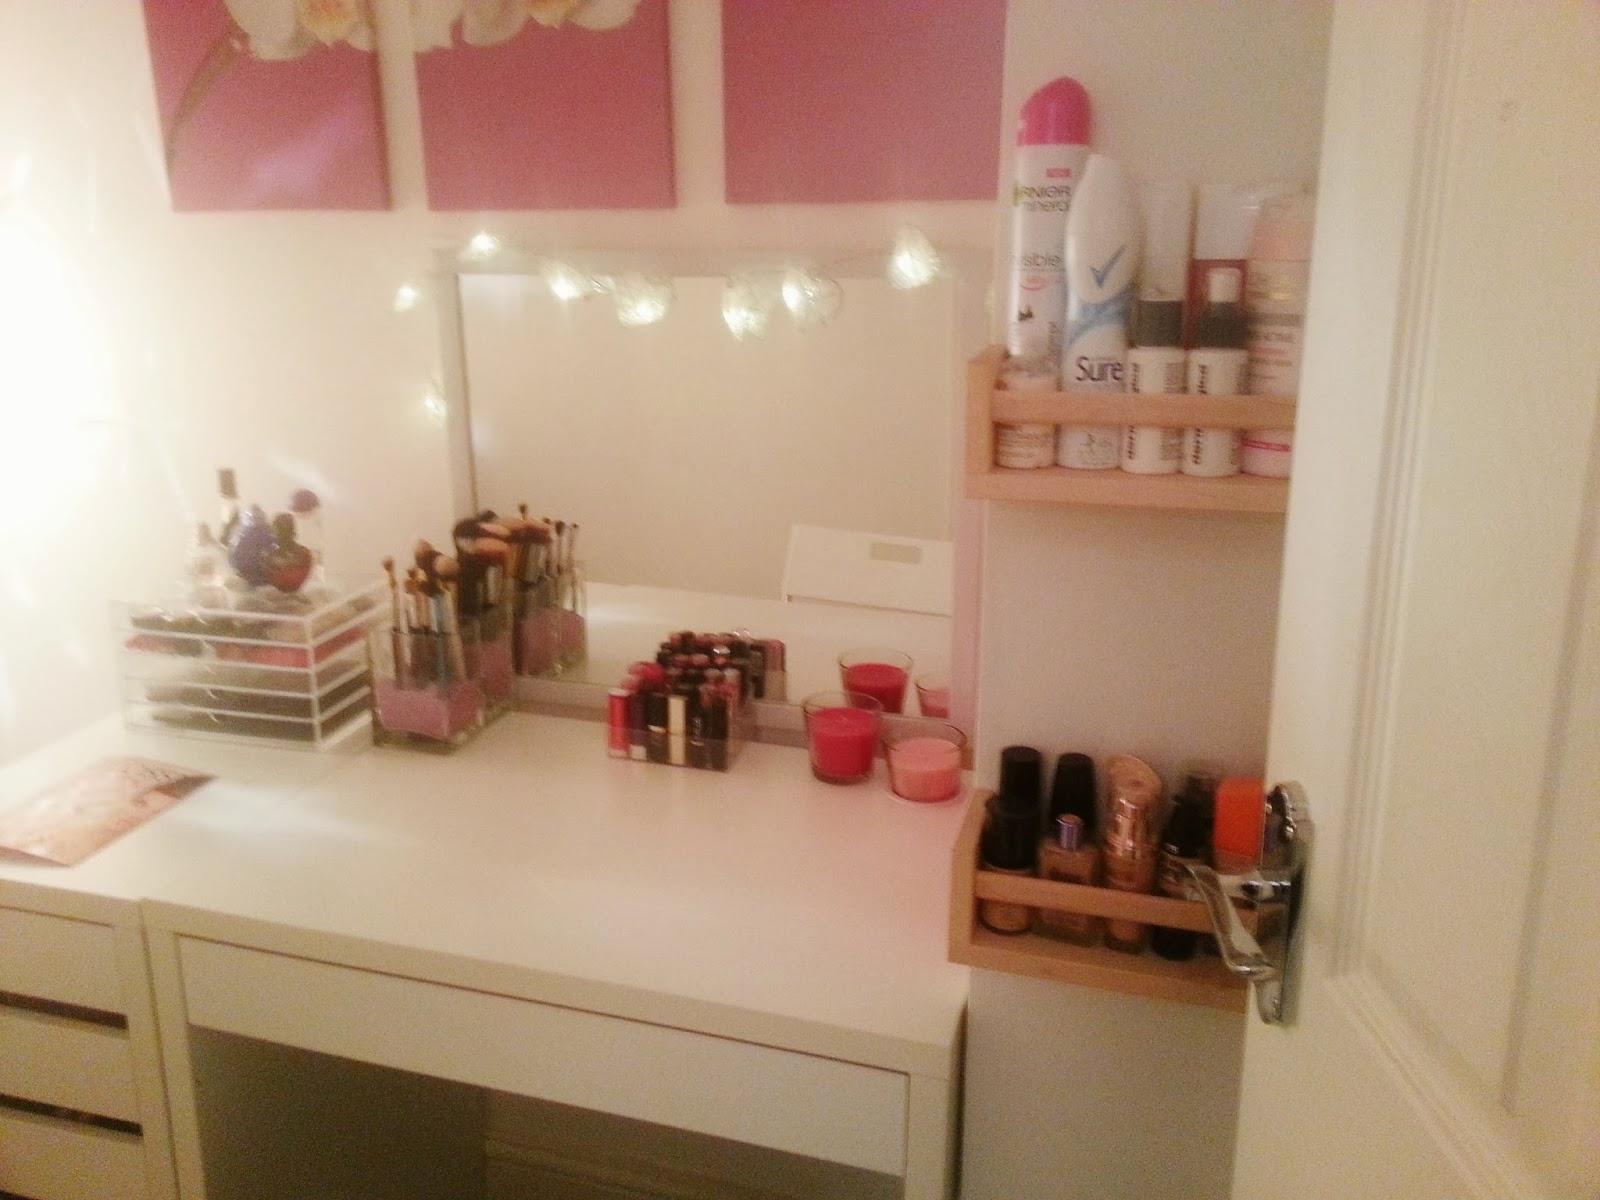 1000 images about room ideas on pinterest makeup desk ikea micke desk and makeup vanities. Black Bedroom Furniture Sets. Home Design Ideas